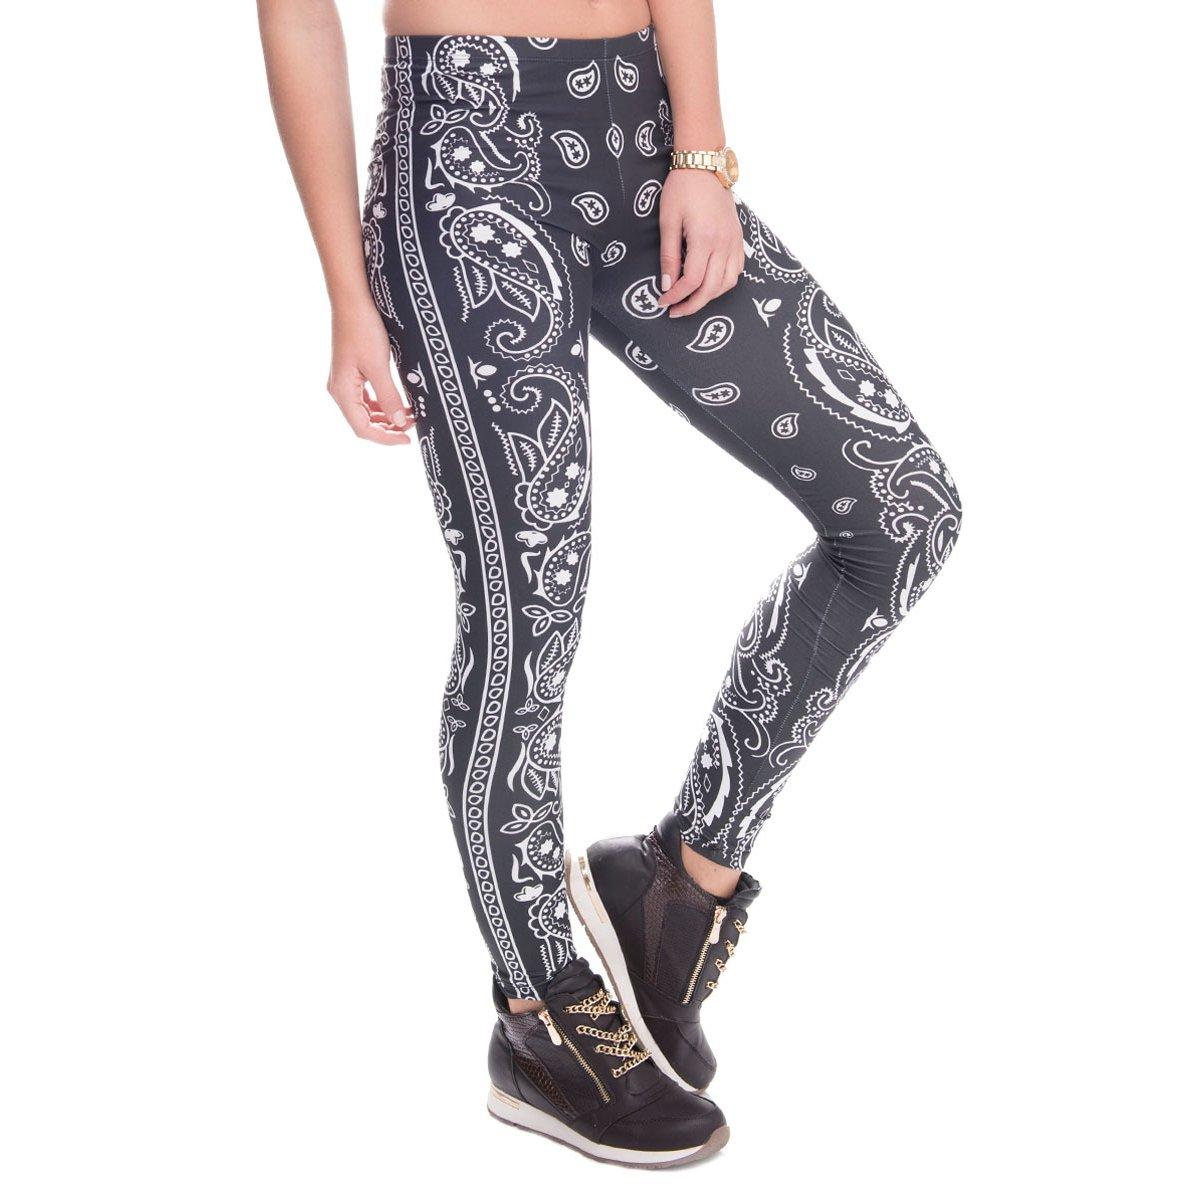 DRESHOW Digital Printed Women's Full-Length Yoga Workout Leggings Thin Capris PA0002-10